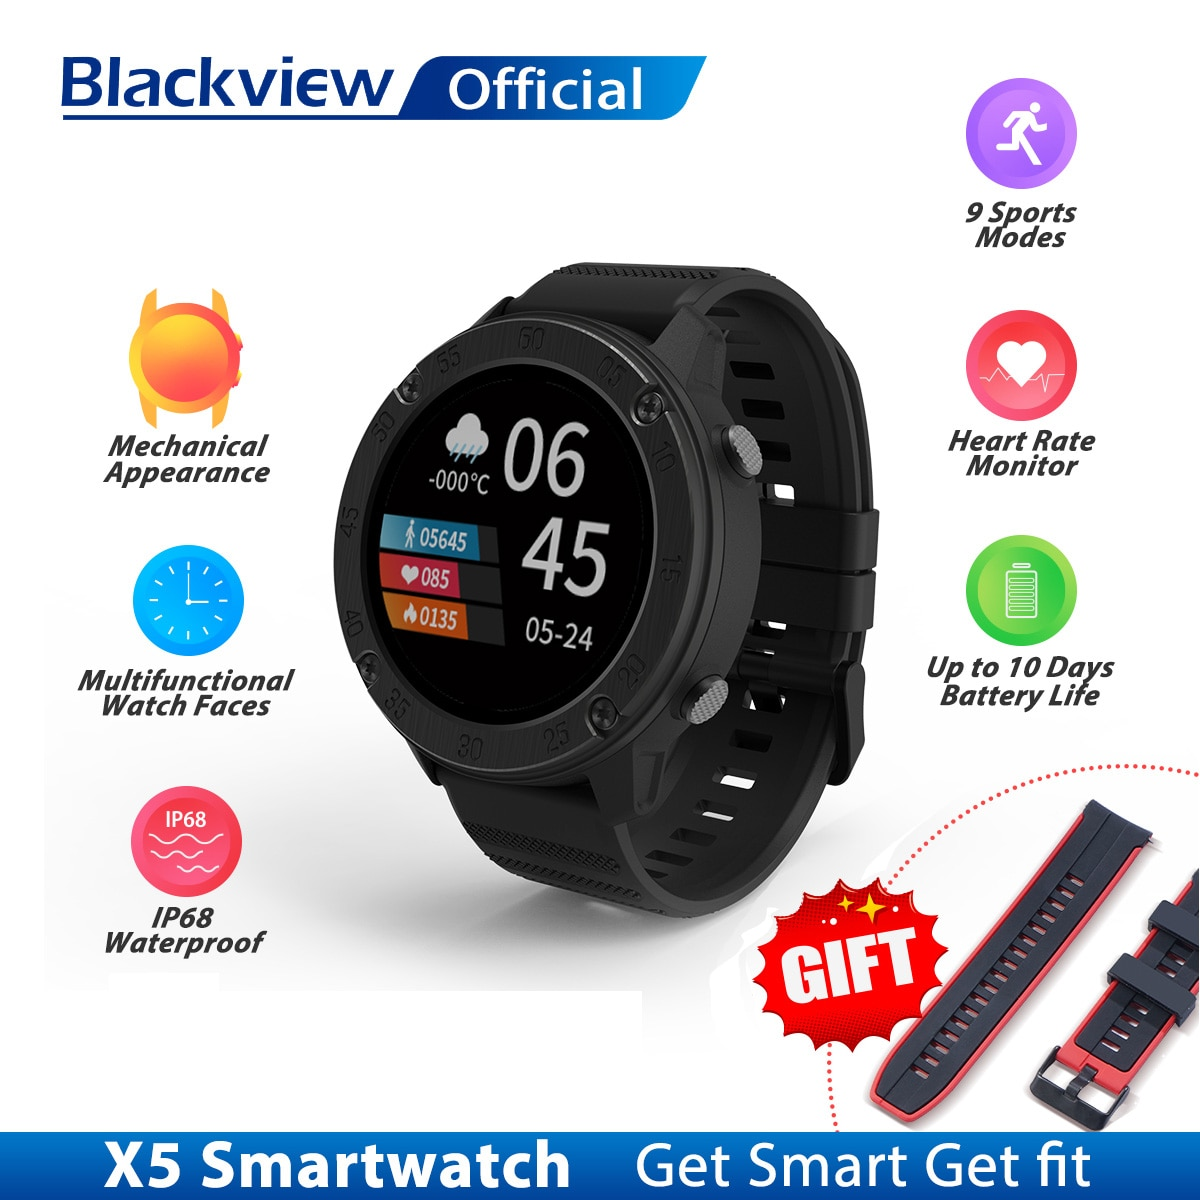 Blackview IP68 SmartWatch X5 الرجال النساء ساعة رياضية ساعة النوم رصد جهاز تعقب للياقة البدنية معدل ضربات القلب ساعة ذكية ل IOS أندرويد